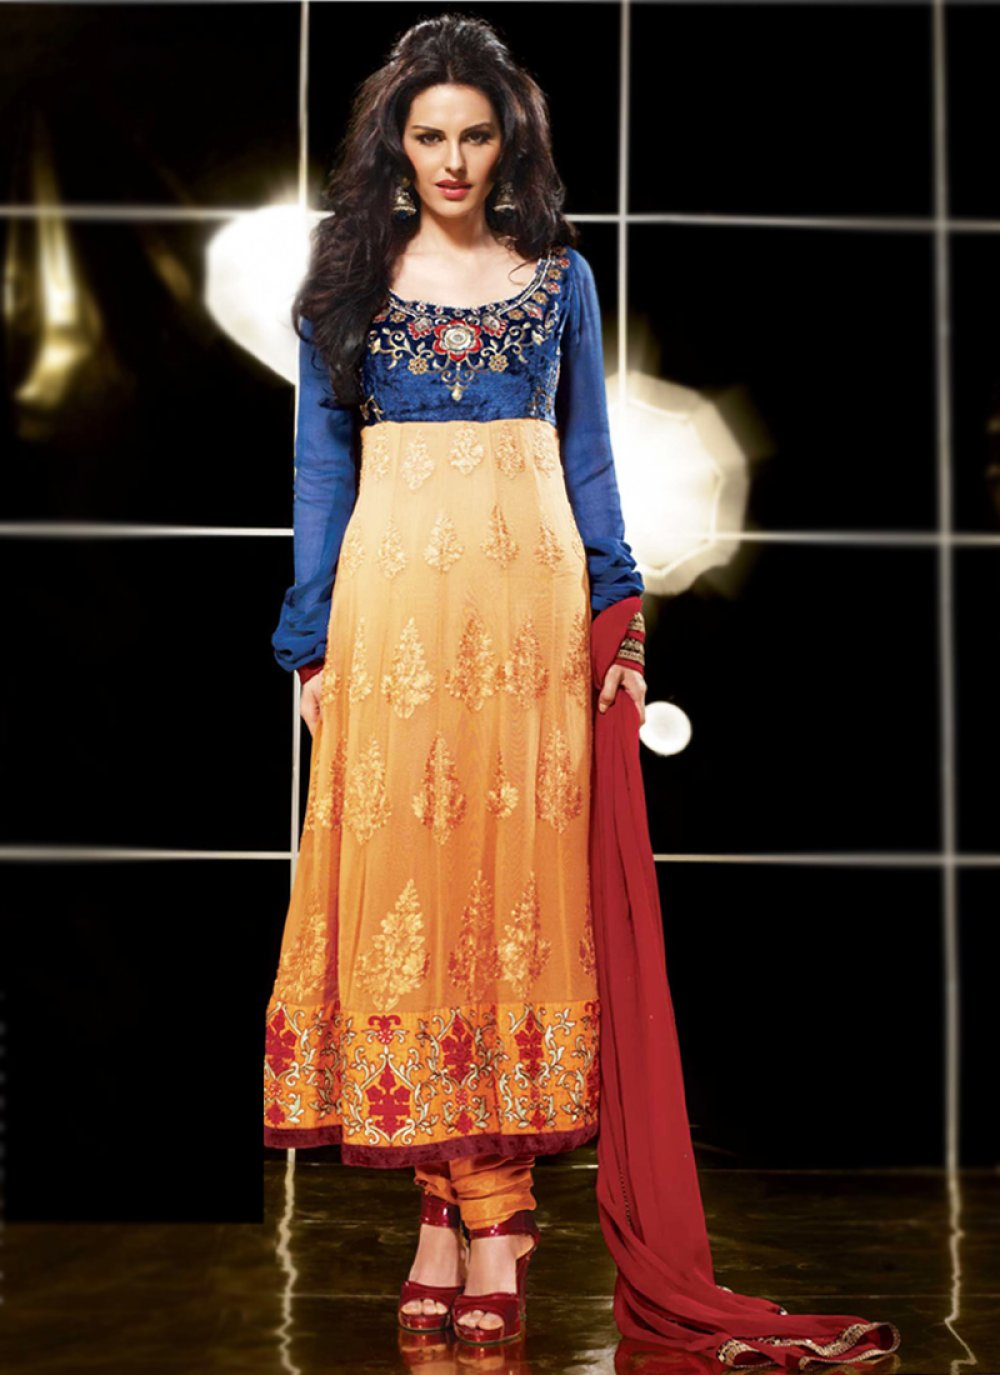 Apricot & Navy Blue Anarkali Suit